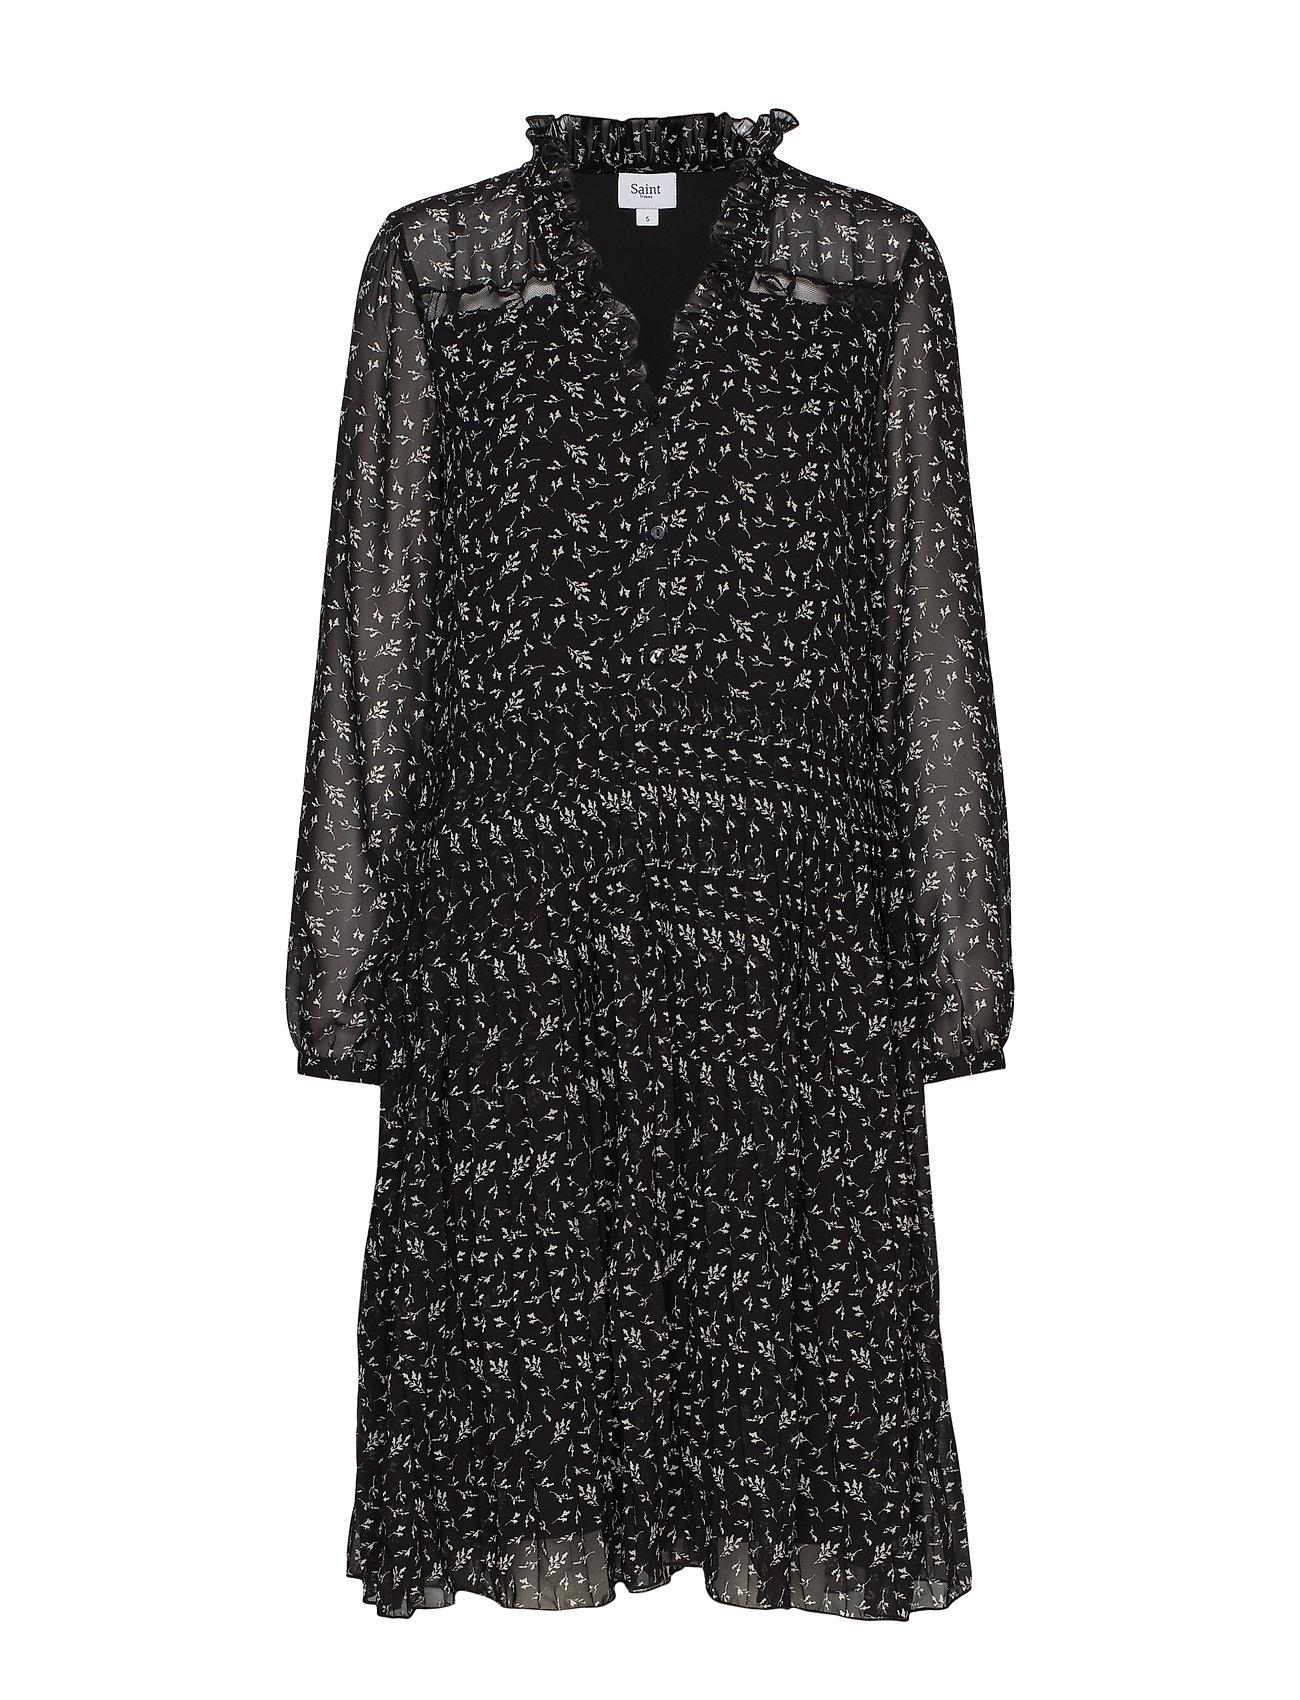 Tropez Dress KneeblackSaint U6036Woven Shirt On c5S3jq4ARL